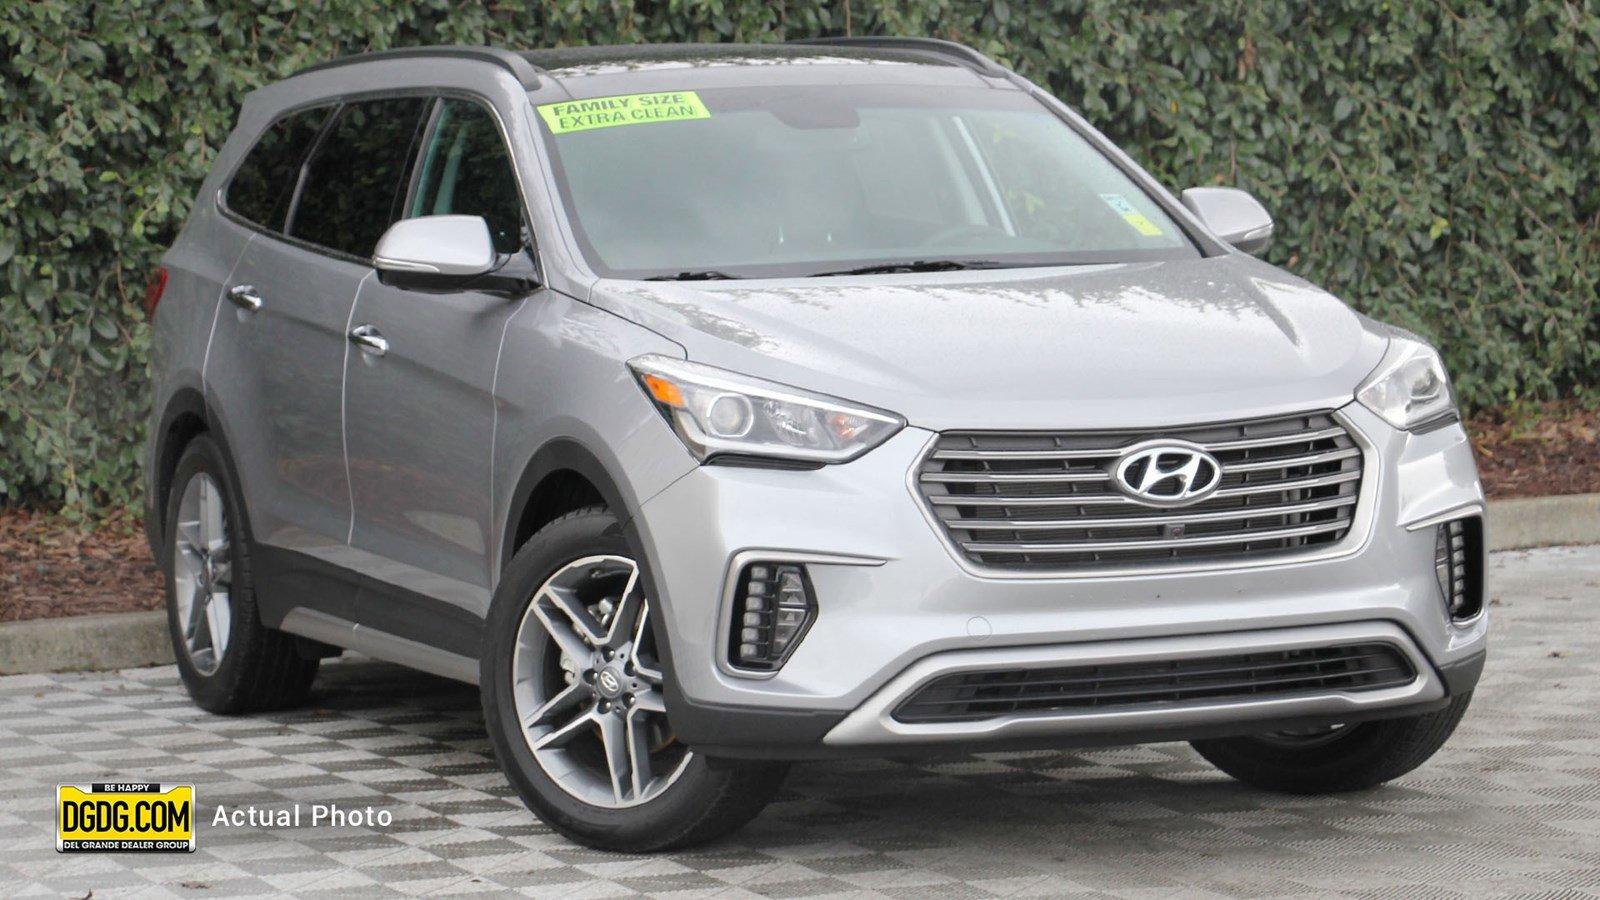 2018 Hyundai Santa Fe Limited w/ Ultimate Package image